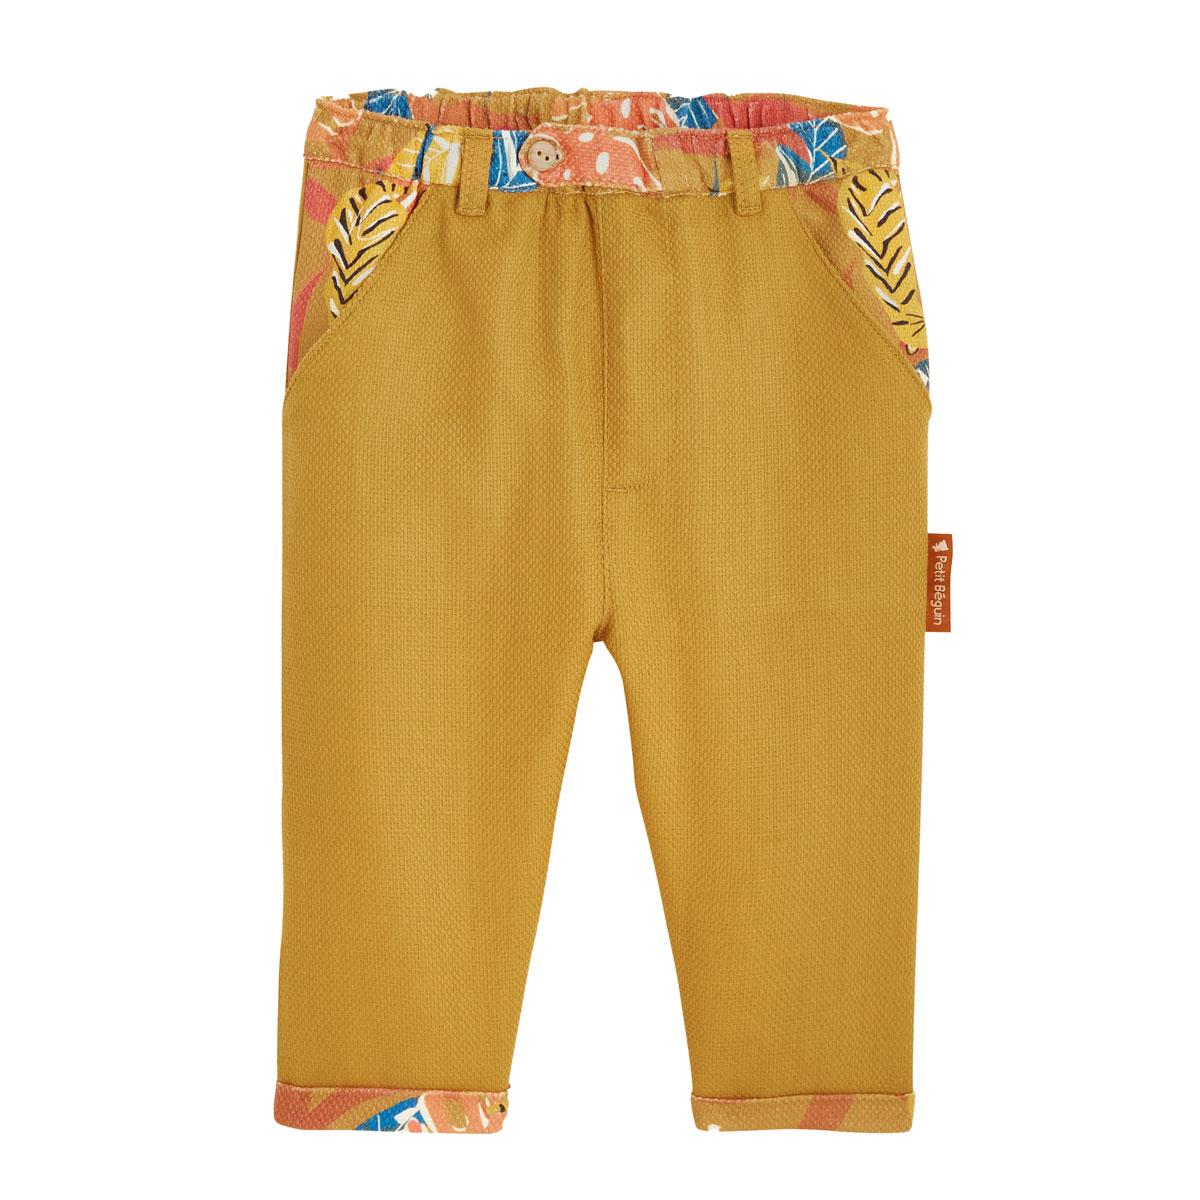 Pantalon garçon Massai